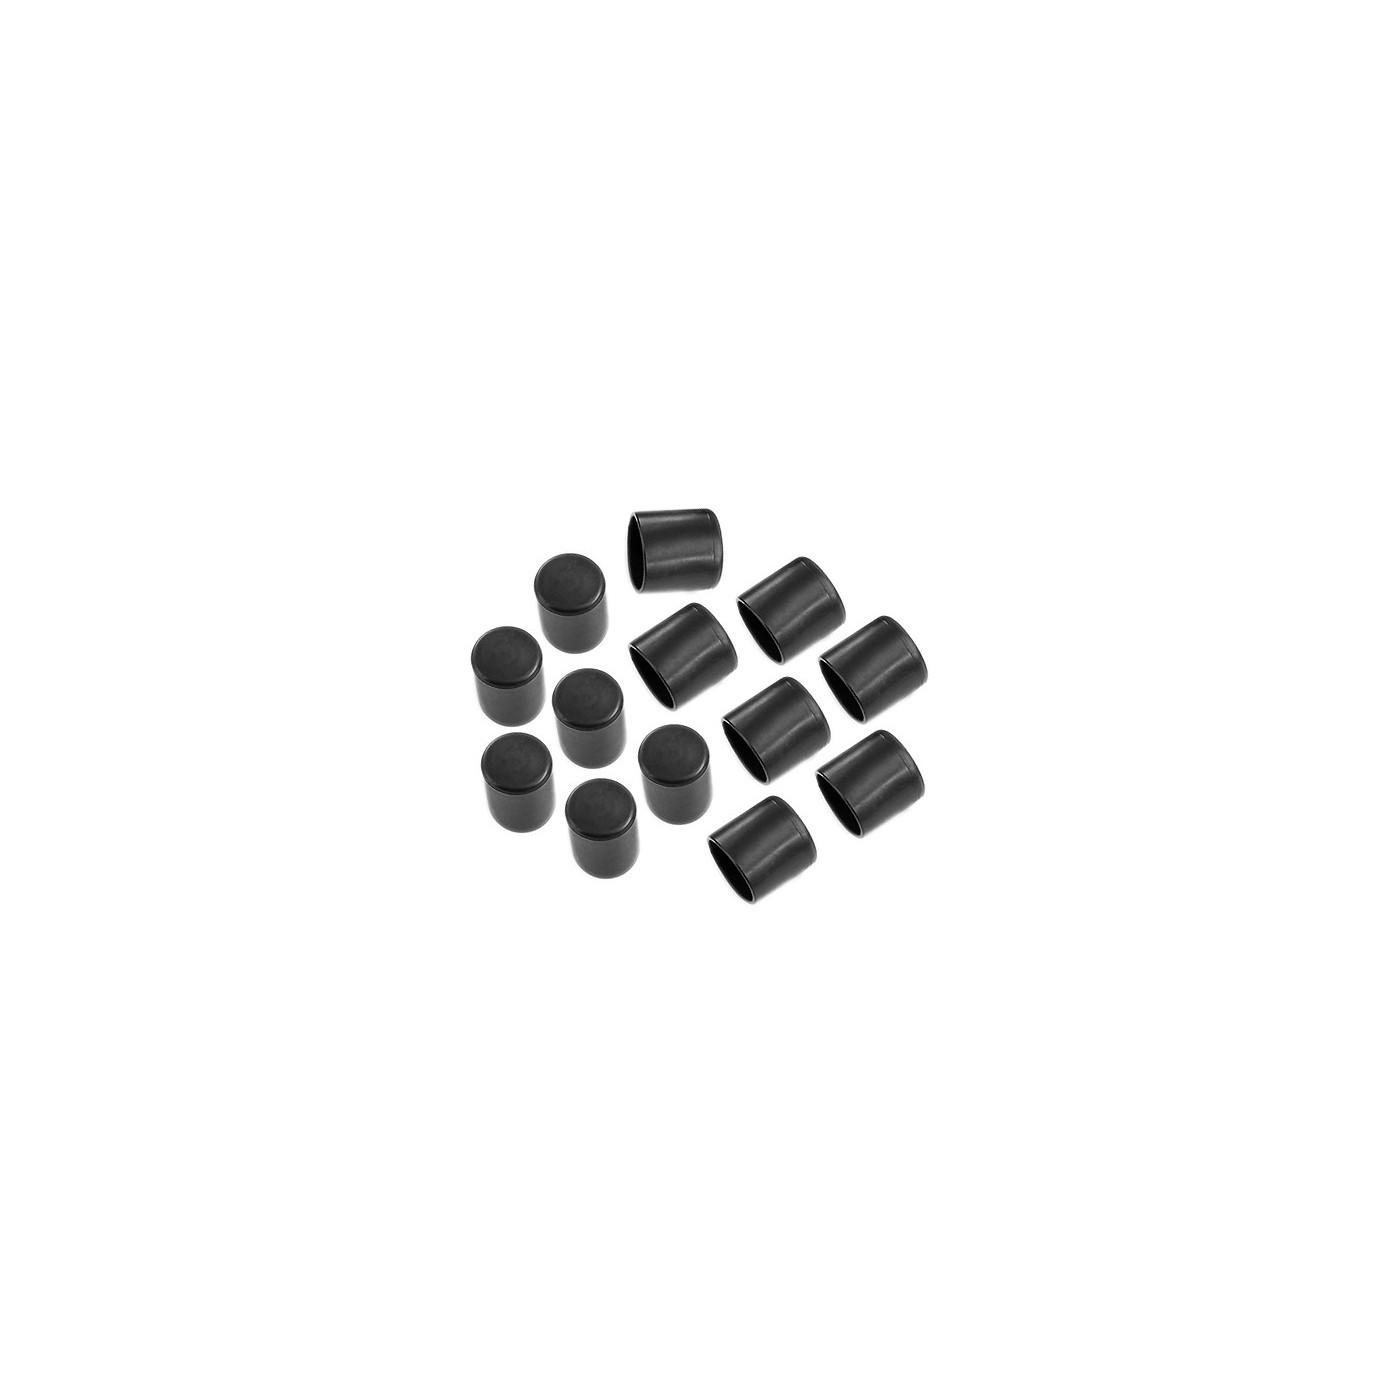 Set of 32 silicone chair leg caps (outside, round, 20 mm, black) [O-RO-20-B]  - 1